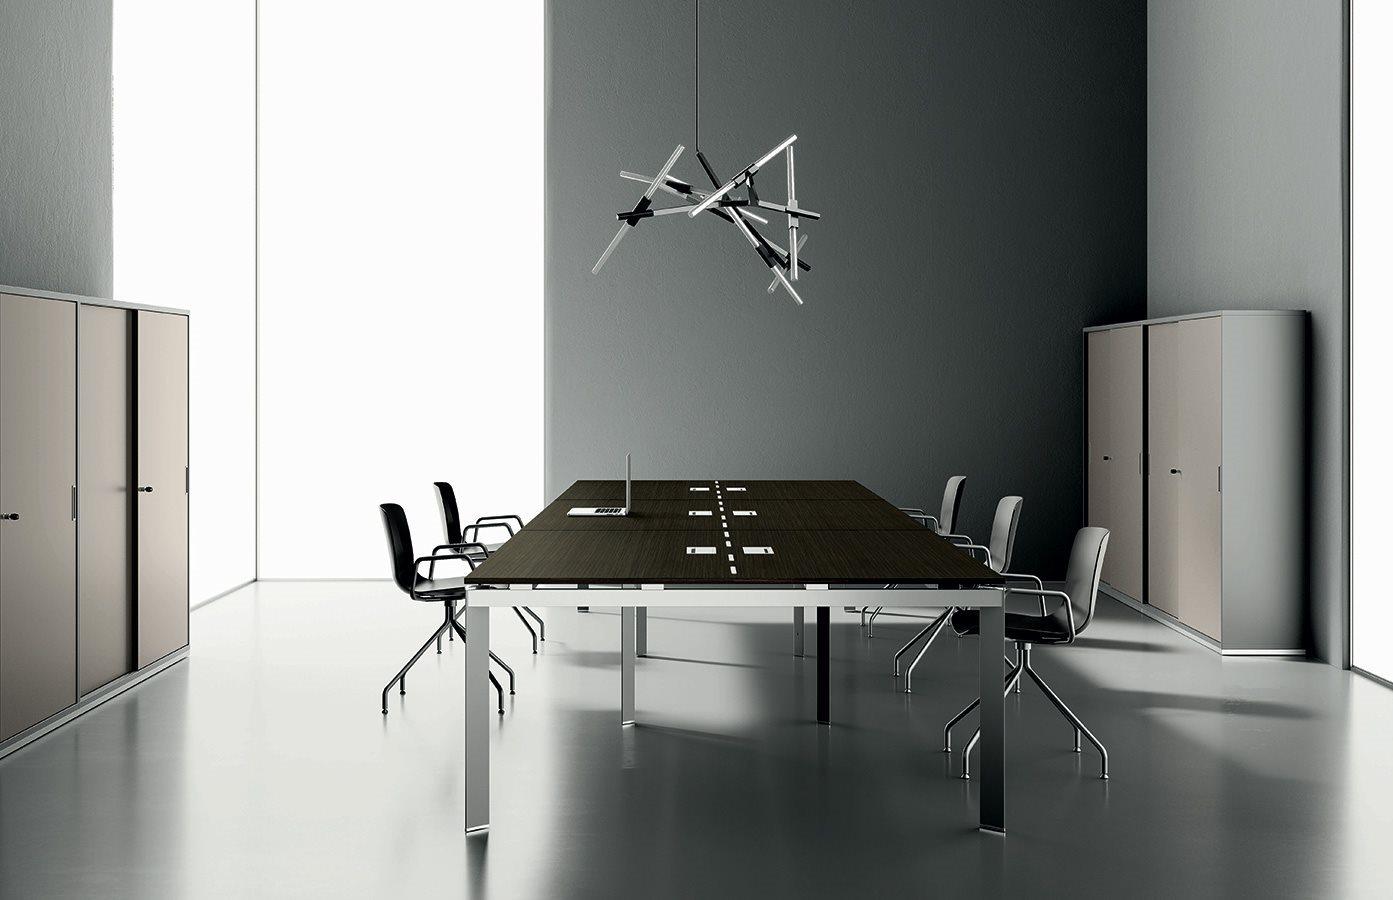 dvo_tavoli_DV990_workstation-table_gallery_7_zoom